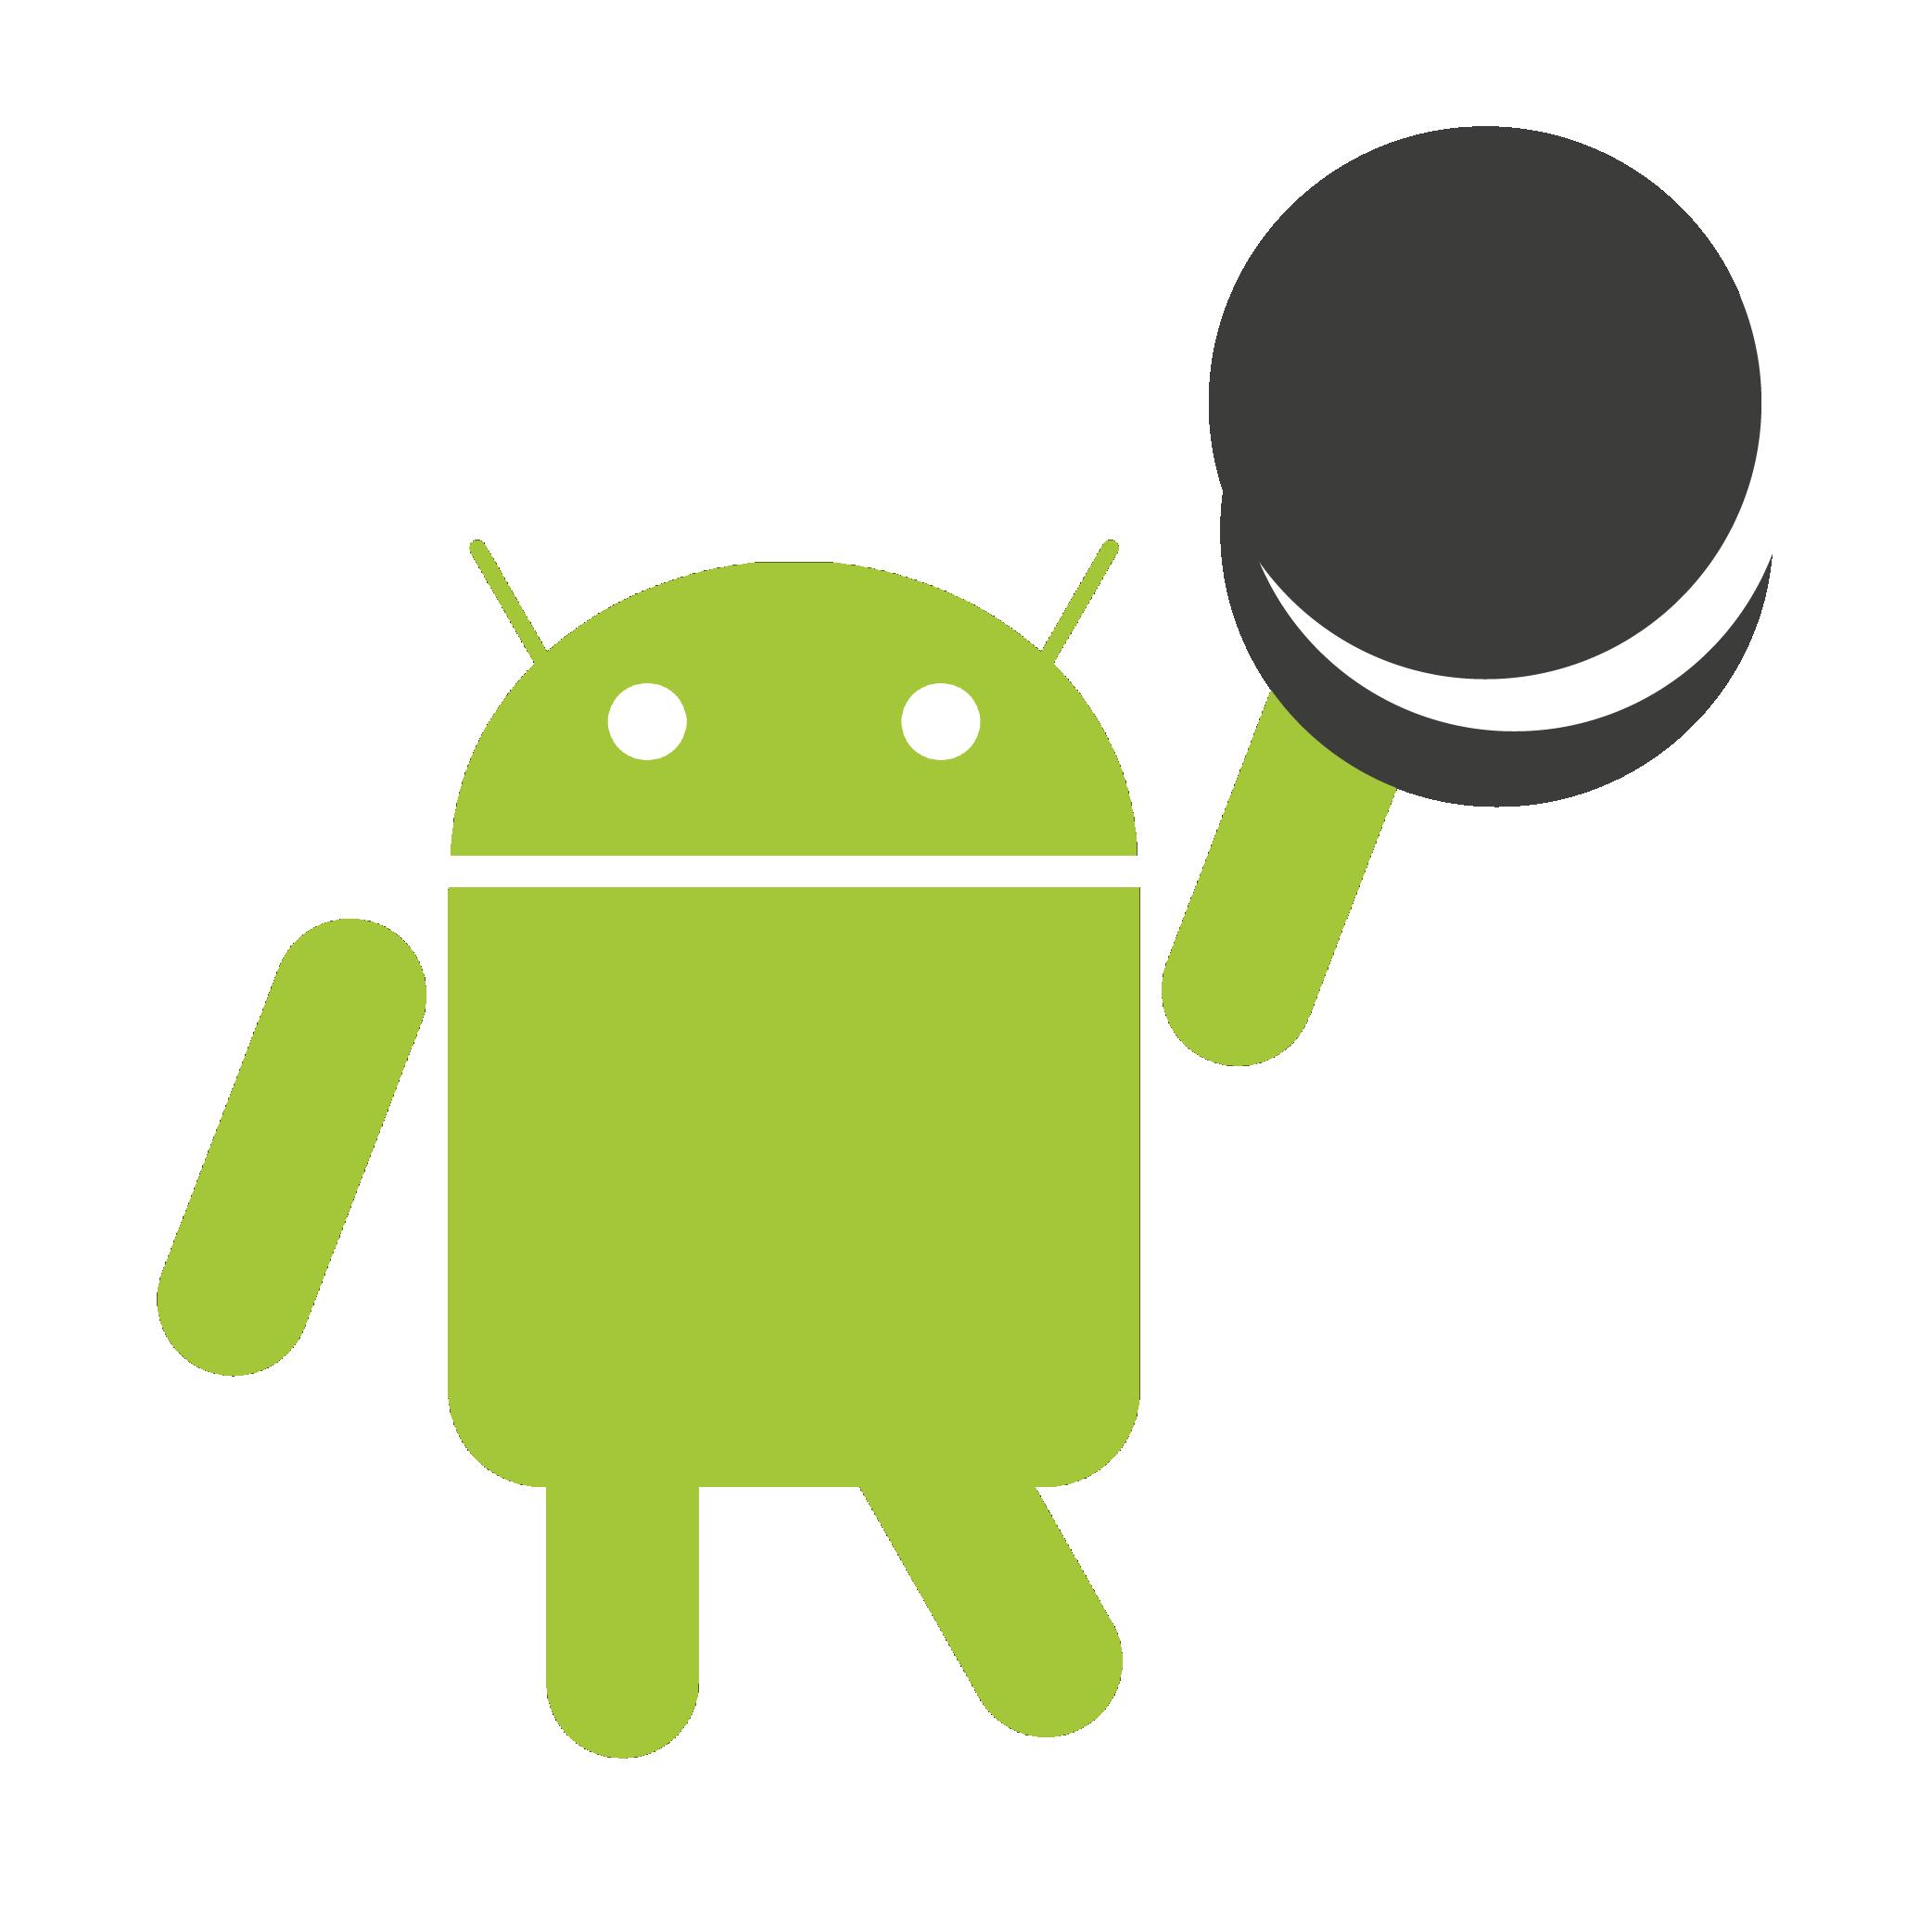 Oreo clipart android. Wird so die neueste